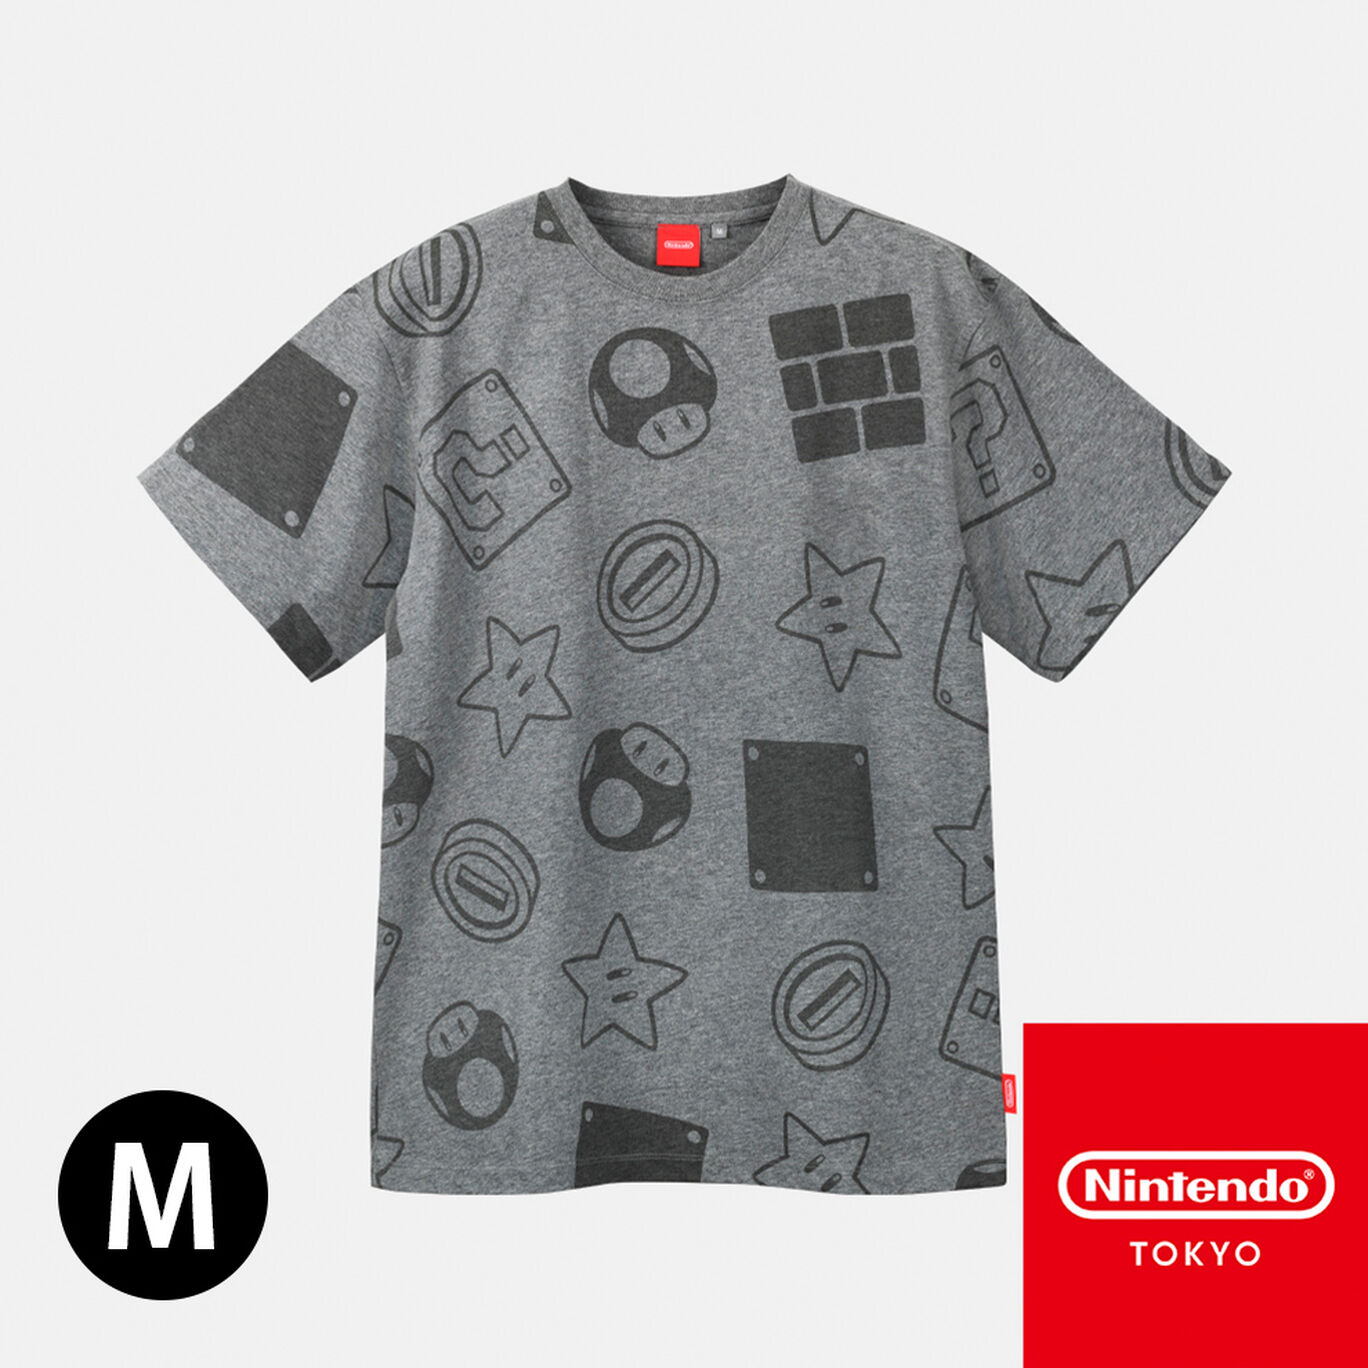 Tシャツ スーパーマリオ B M【Nintendo TOKYO取り扱い商品】